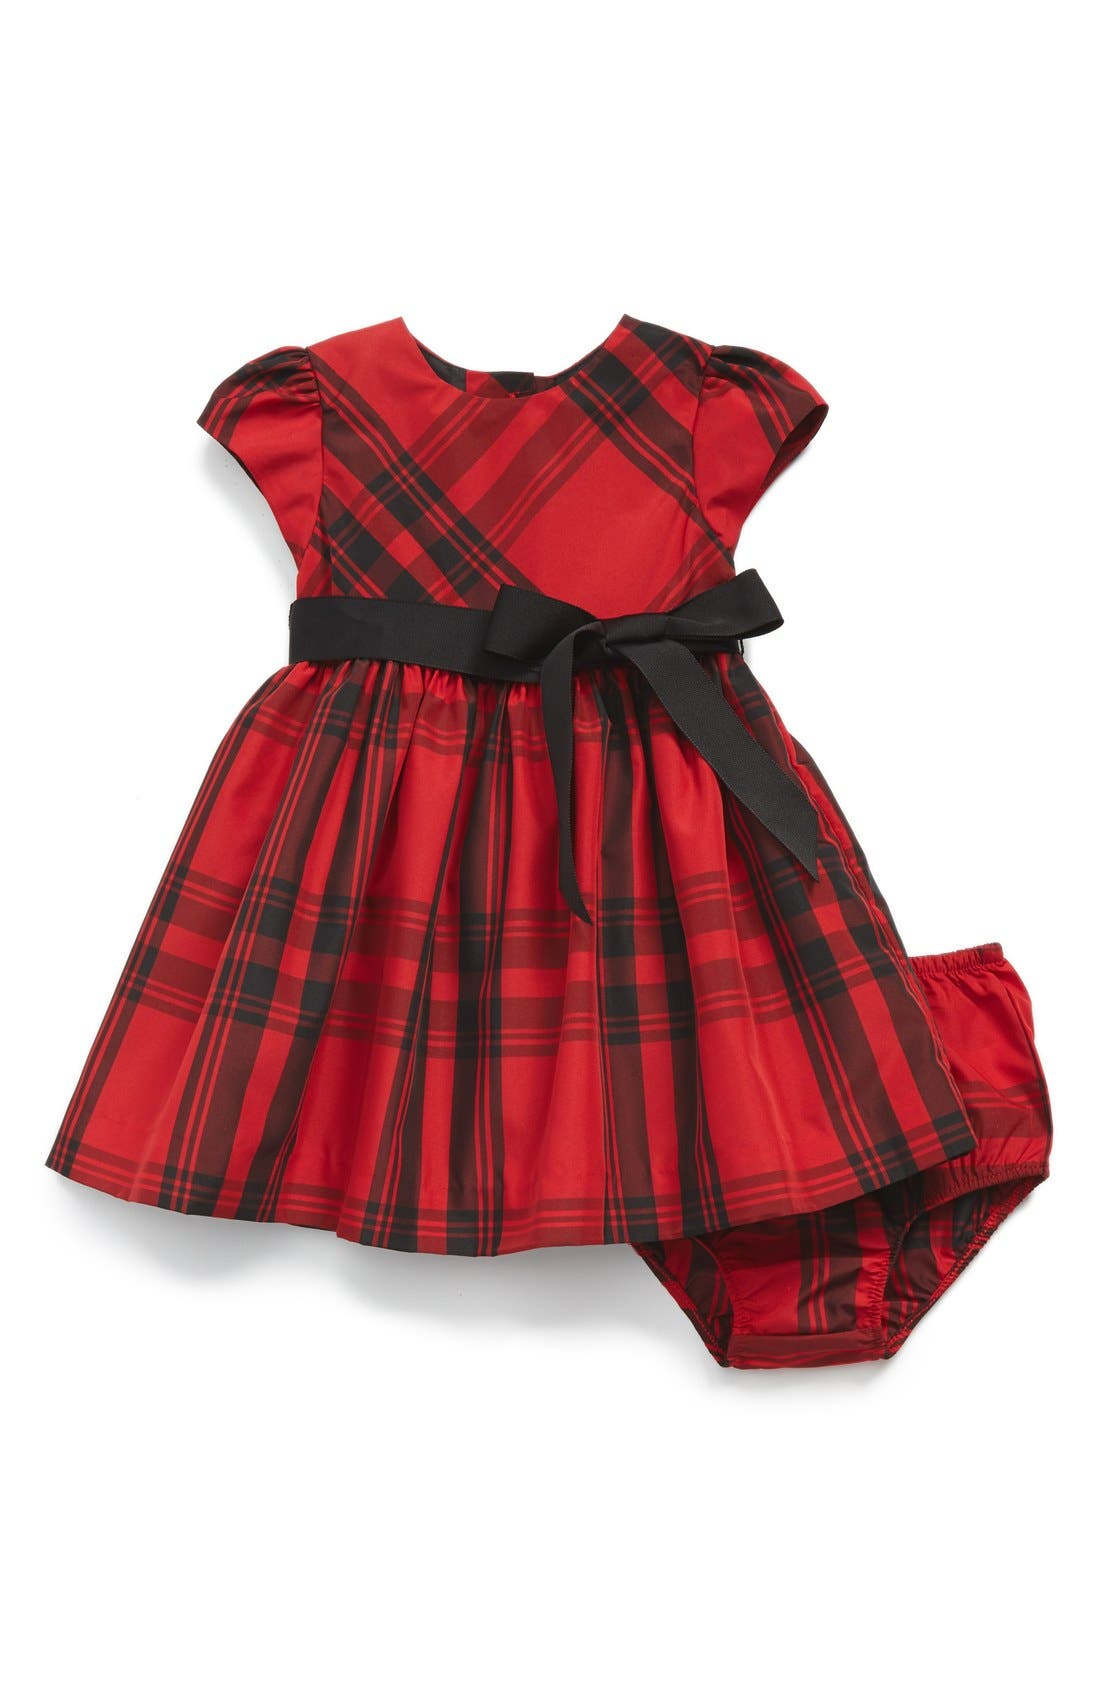 Ralph Lauren Plaid Taffeta Dress Baby Girls